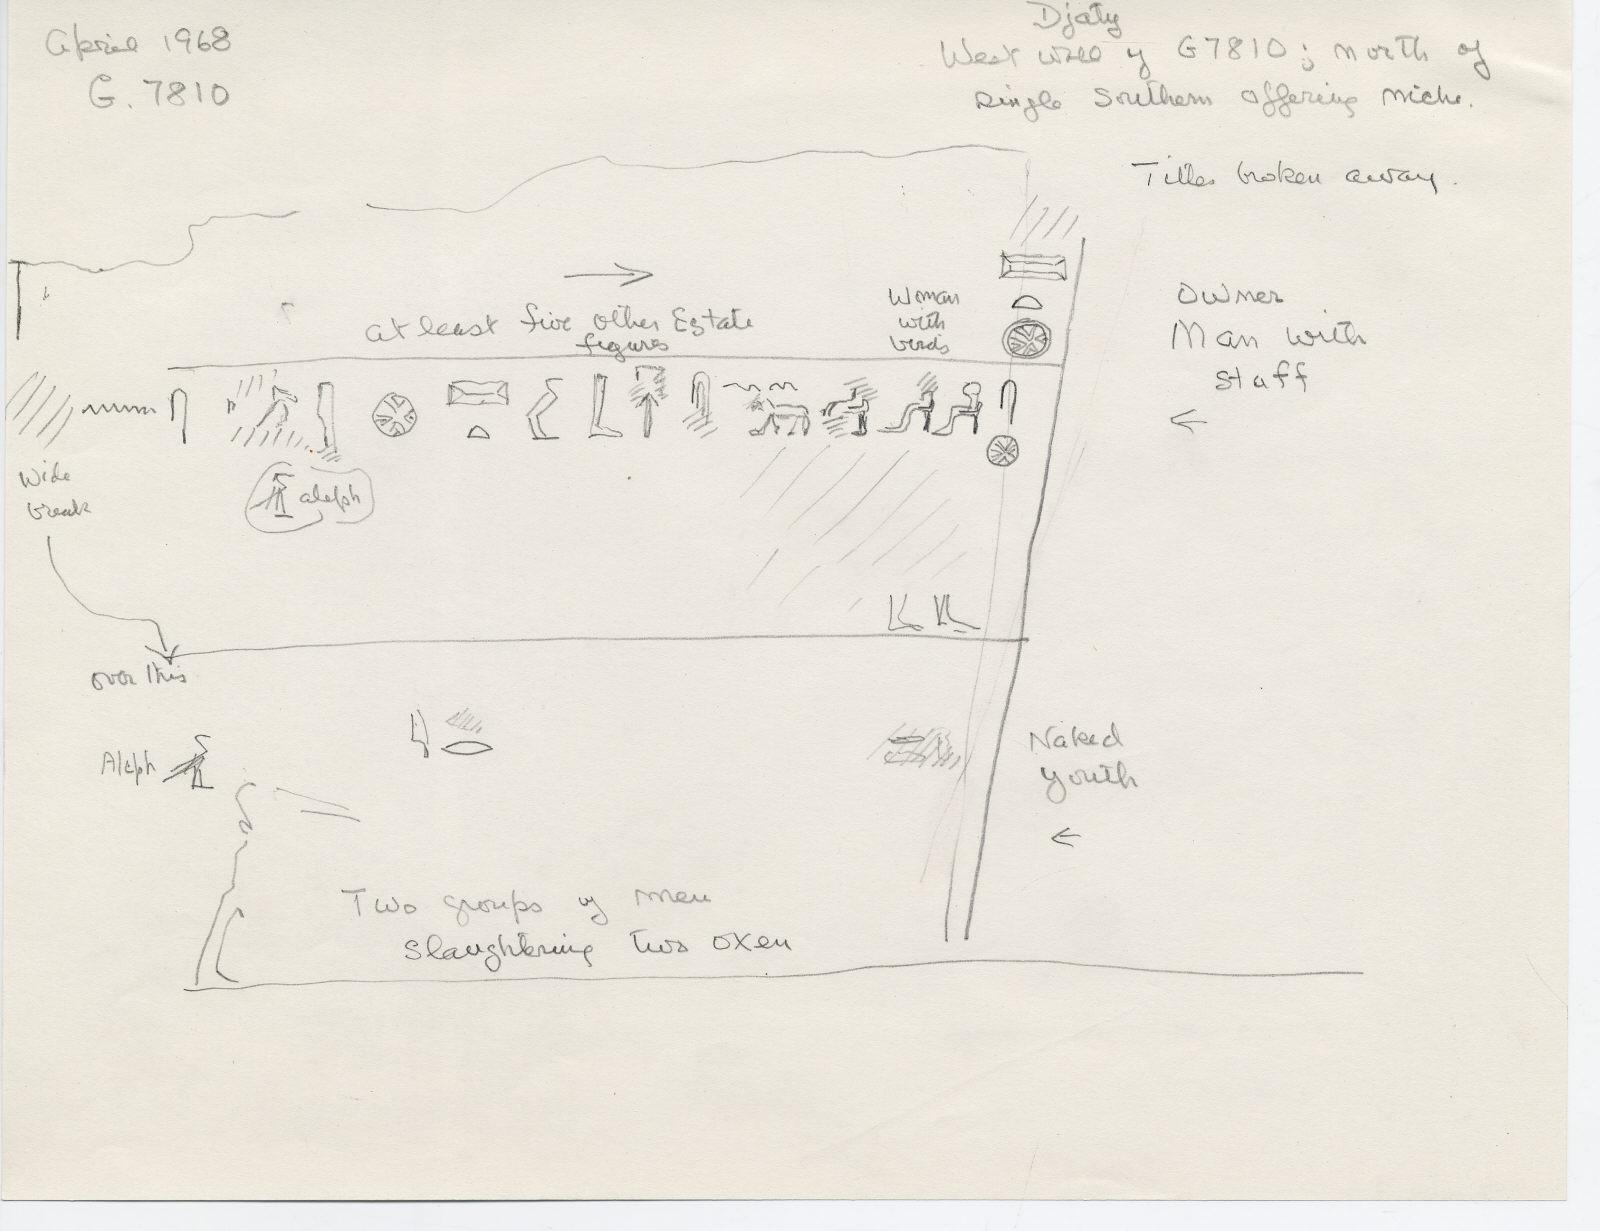 Drawings: G 7810: relief from W wall, N of false door